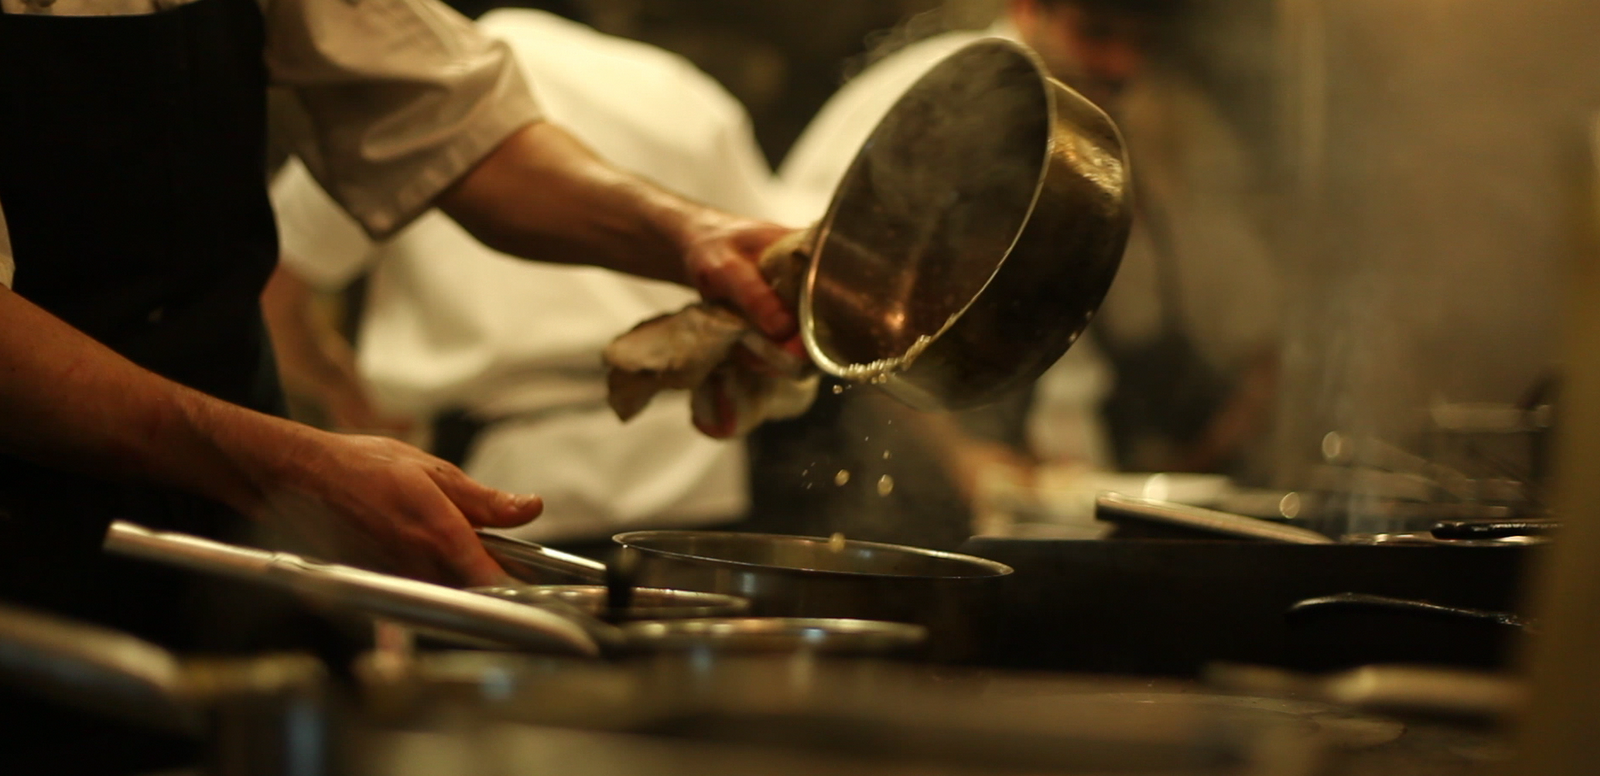 Kitchen Confessions; The Chef, The Kitchen, The Magic.